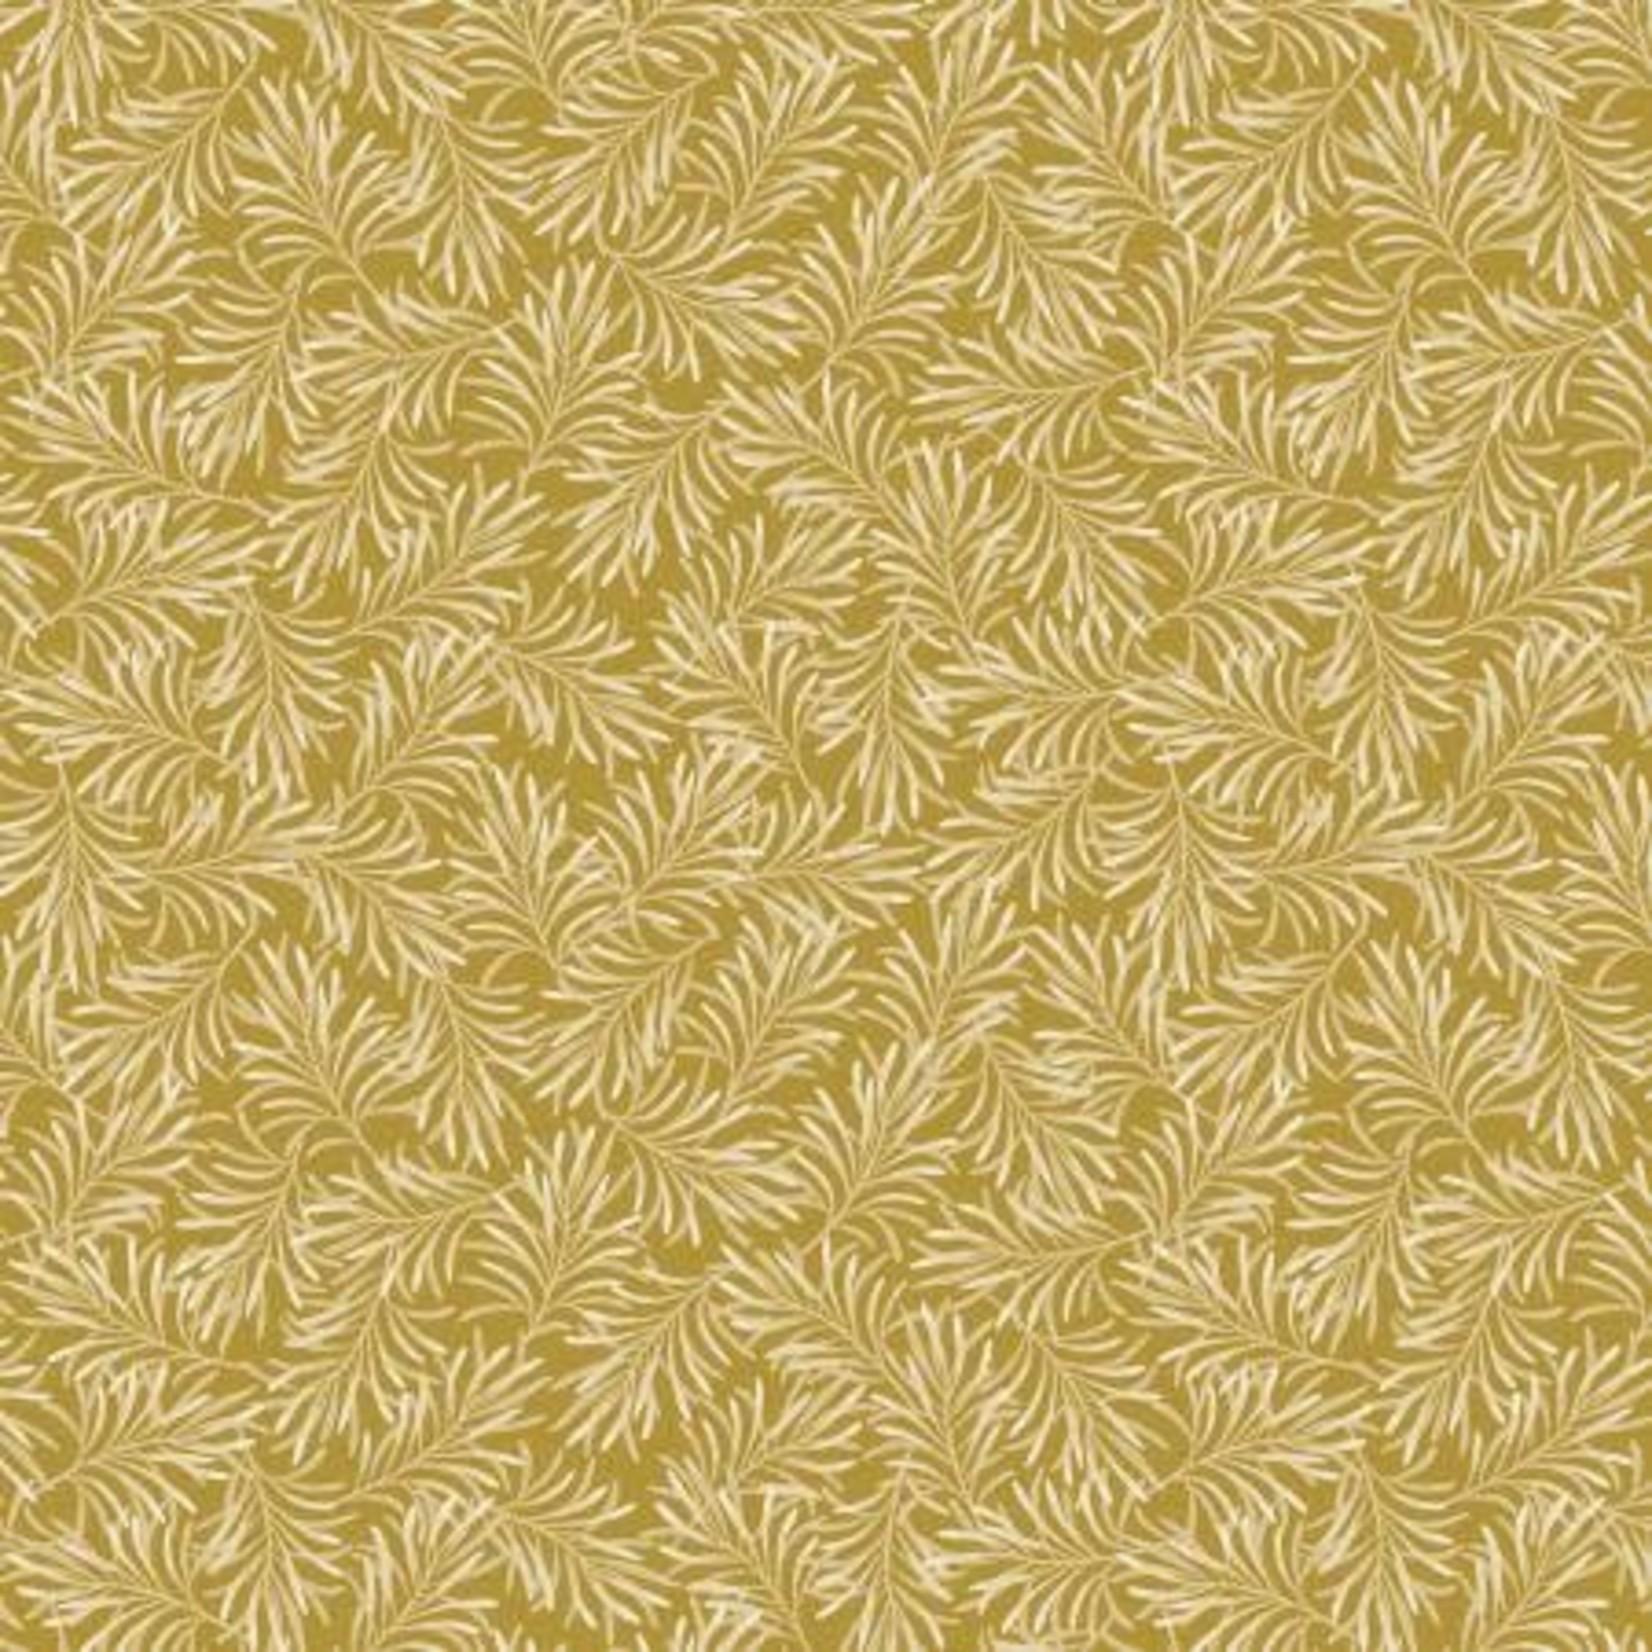 Benartex Studio Boughs of Beauty - Gold